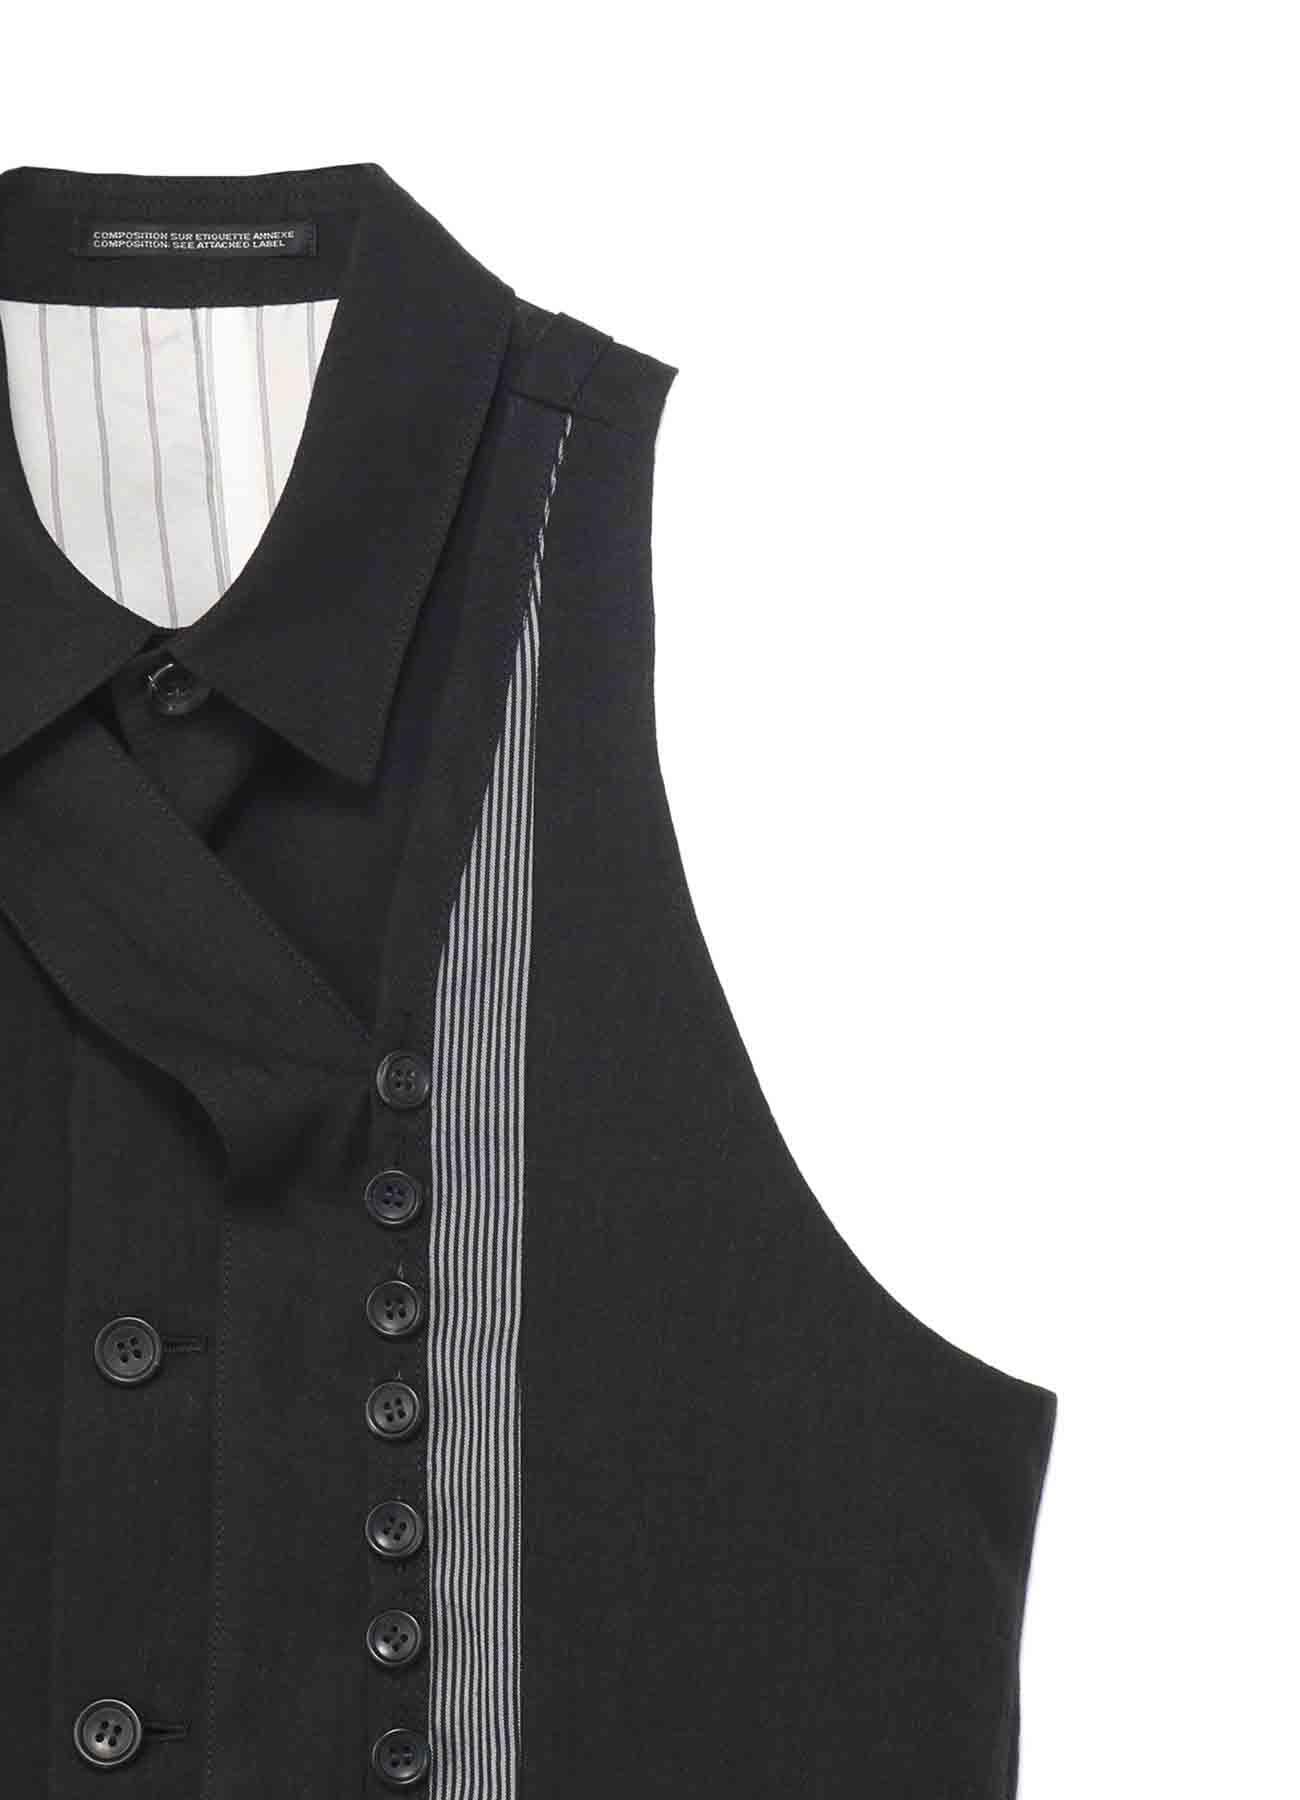 60Li解撚C.C左レイヤーシャツ襟ベスト